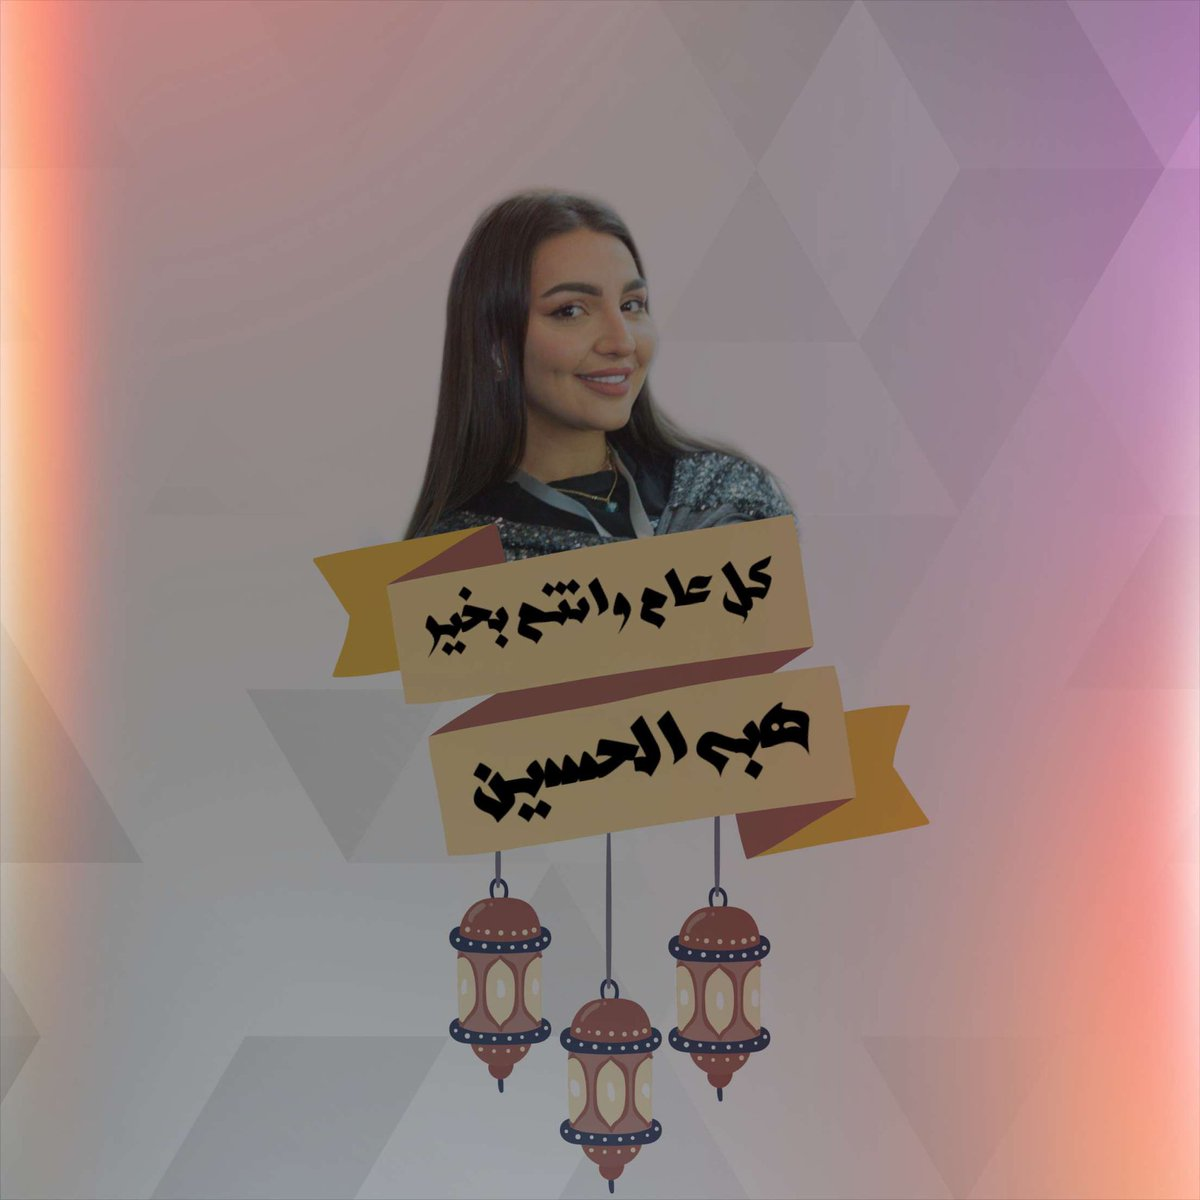 Tweety S Medii Od Uzivatele هبه آلحسين Hebamedia1 Twitter